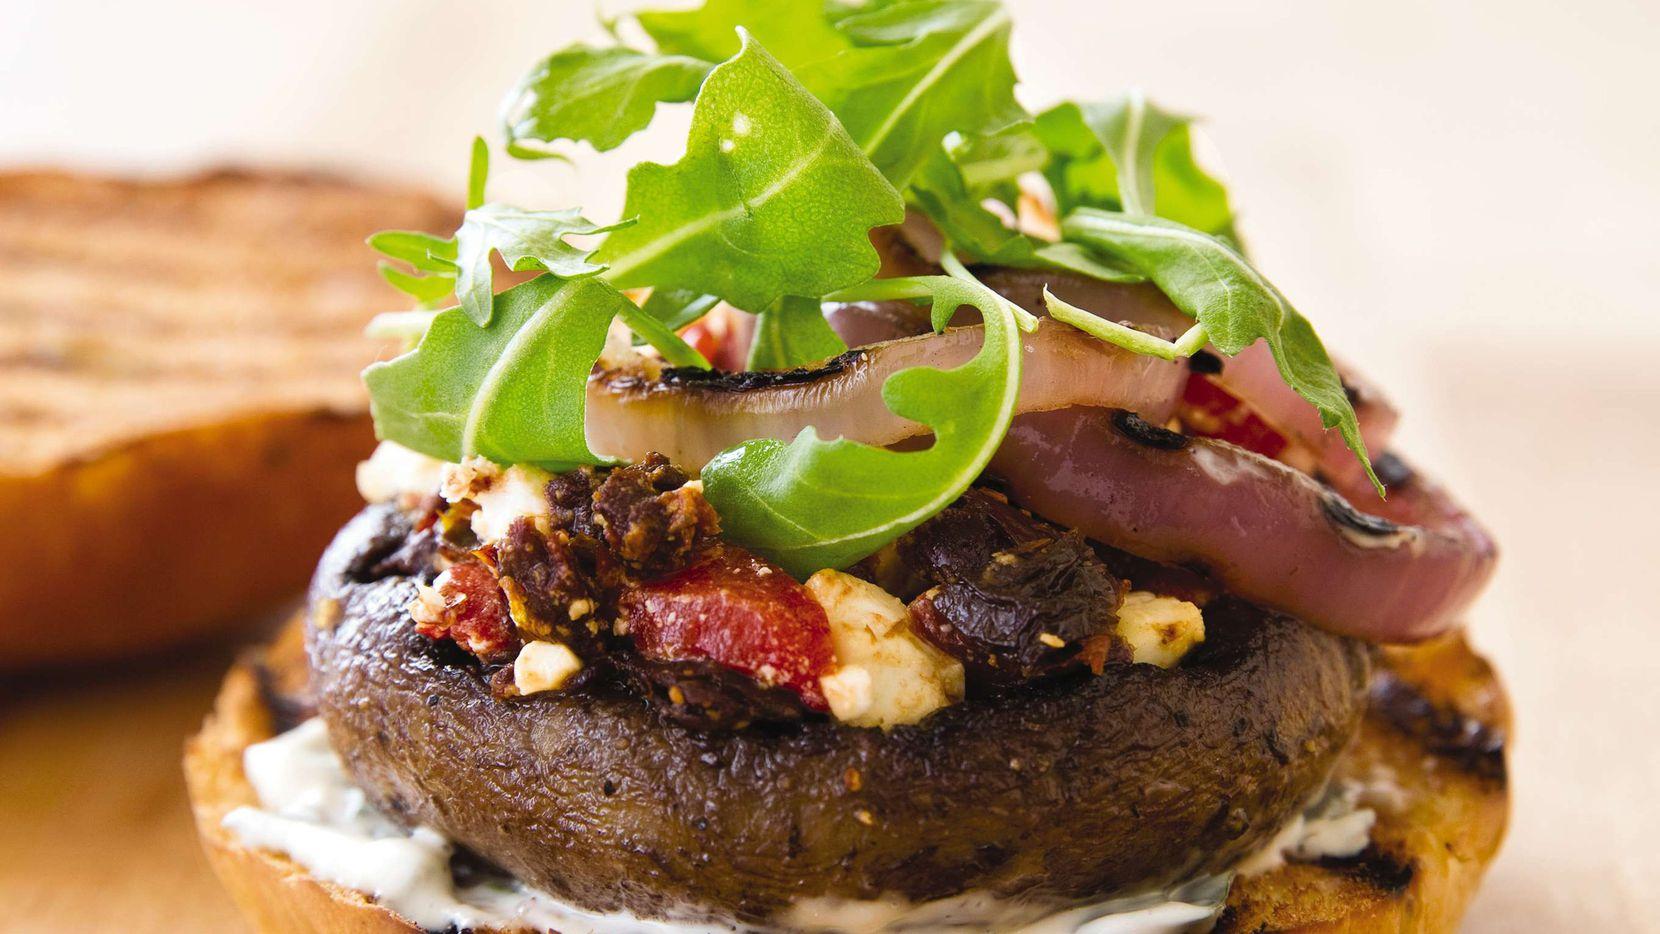 Hamburguesa de champiñones portobello. (Joe Keller/America's Test Kitchen via AP)